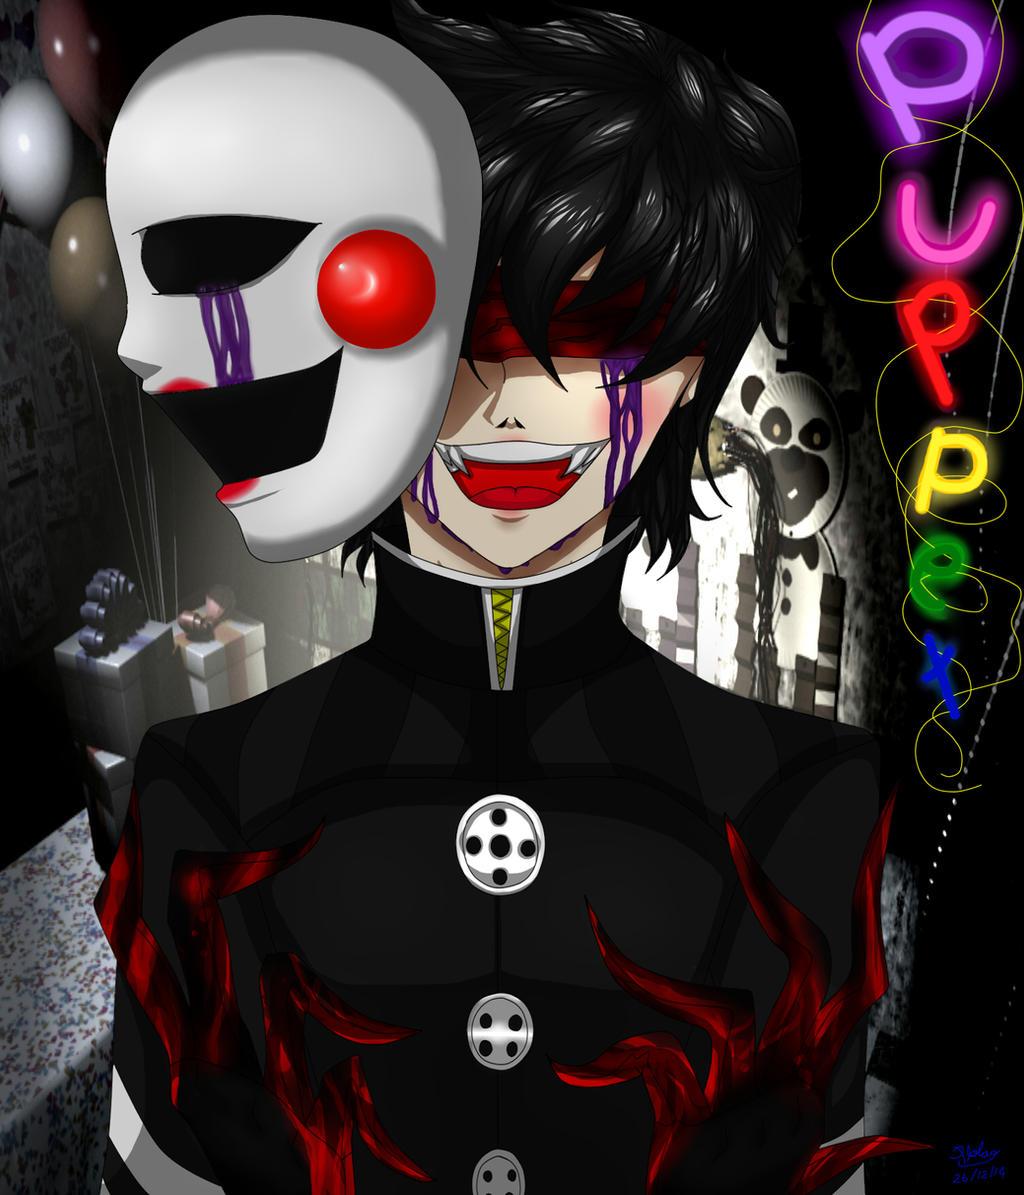 The puppet fnaf 2 by creepywolf2014 on deviantart